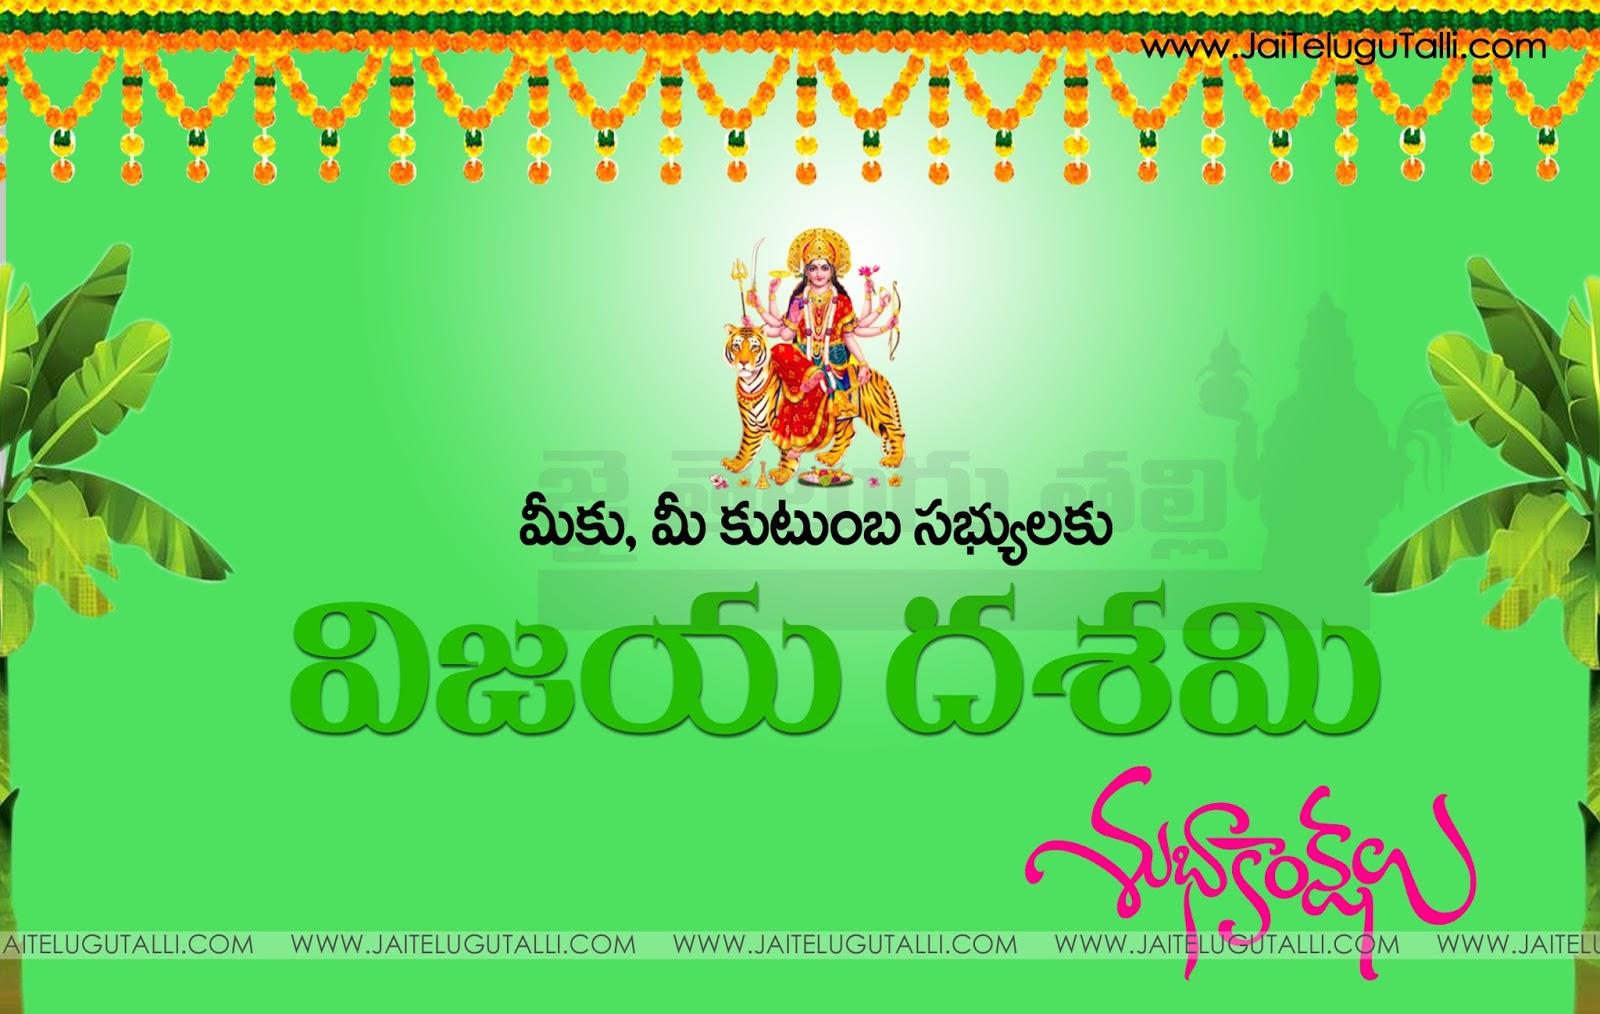 Happy vijayadasami 2017 pictures and wishes in telugu www vijayadasami widely celebrated in andhrapradesh karnatakadussehra quotes in telugu greetings in telugu m4hsunfo